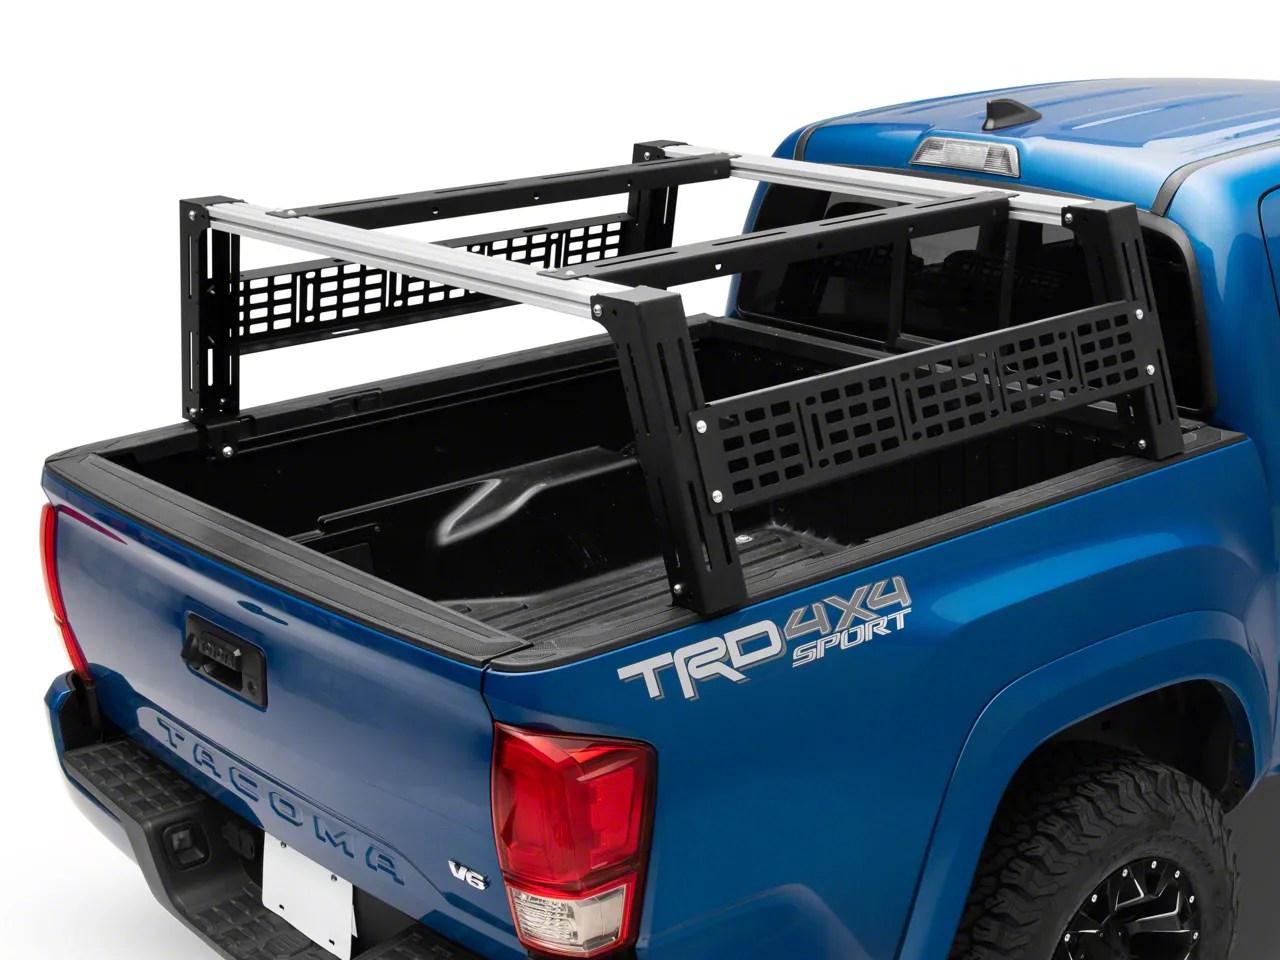 cali raised led overland bed rack system tall profile 05 21 tacoma